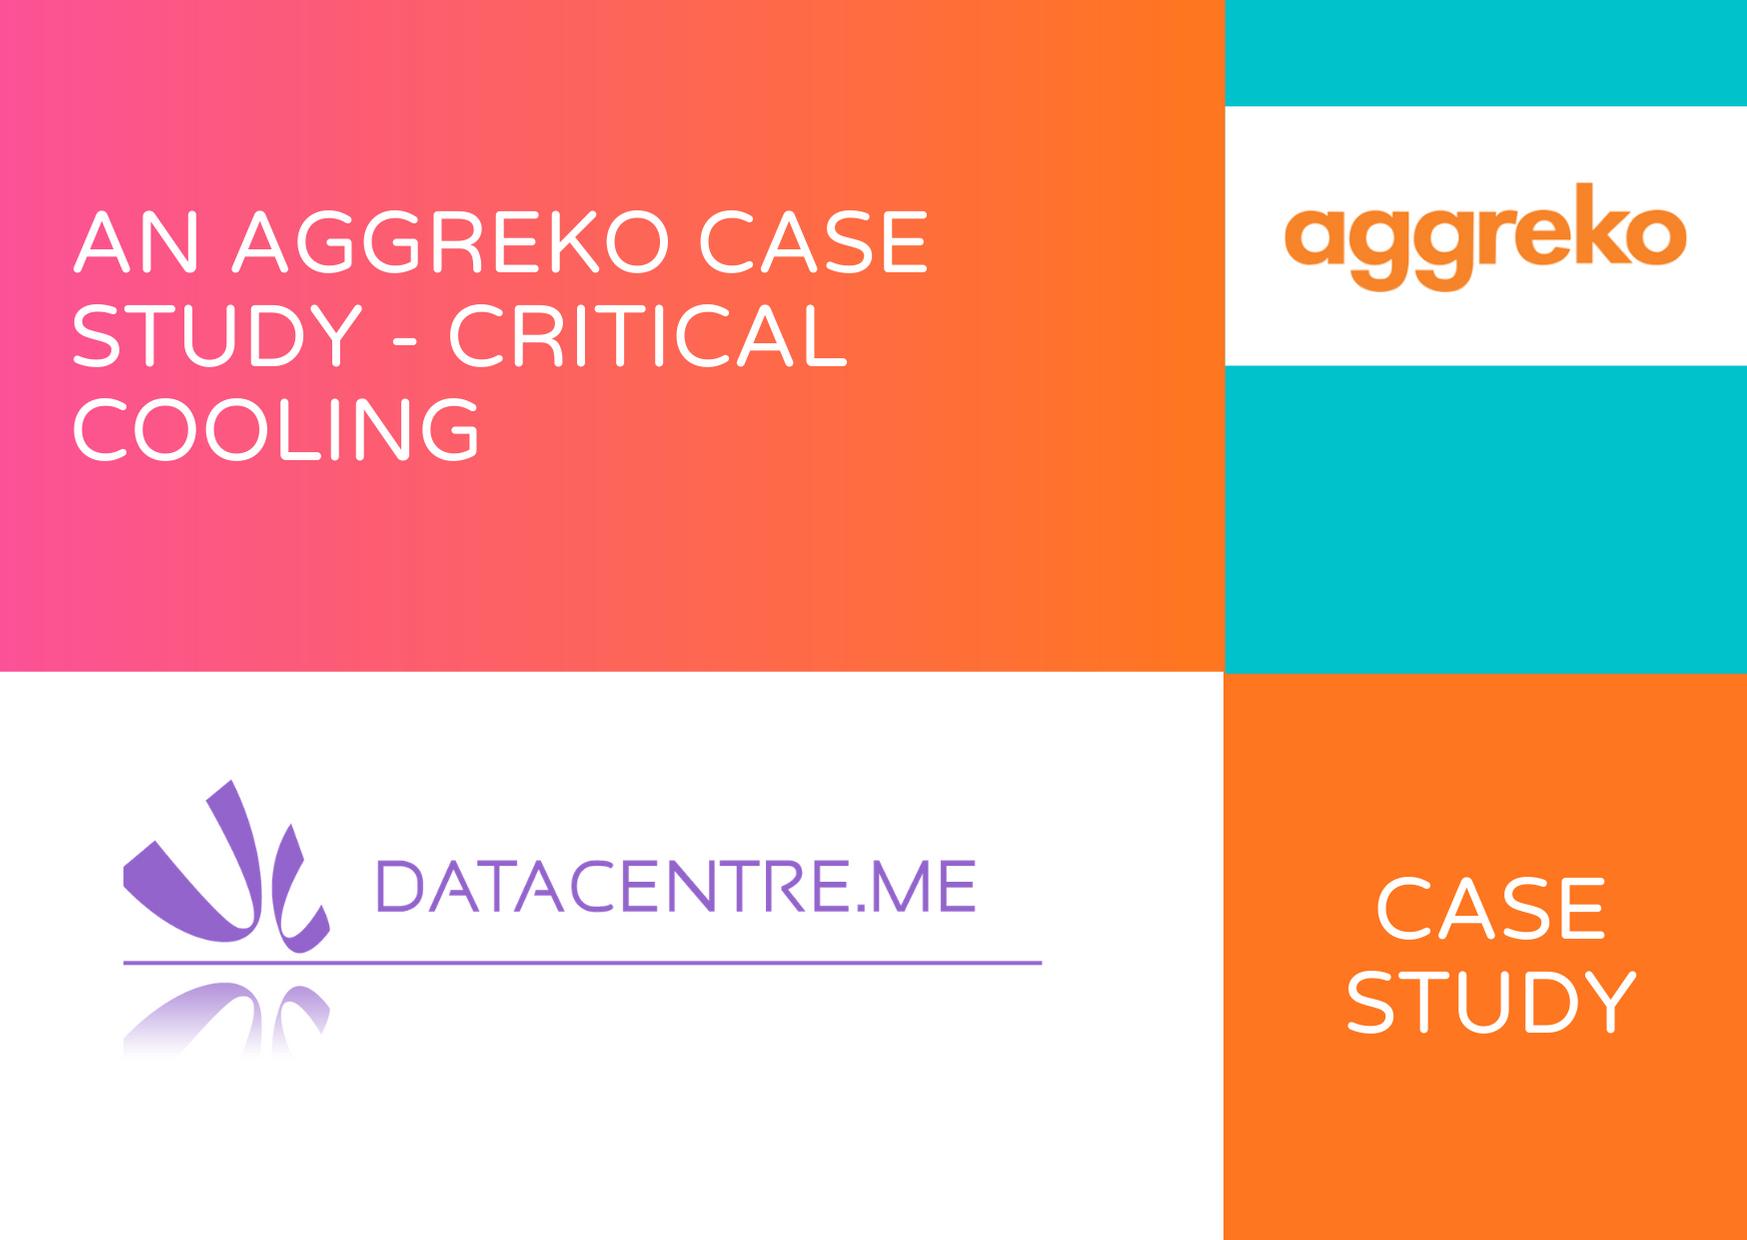 An Aggrekko Case Study - Critical Cooling